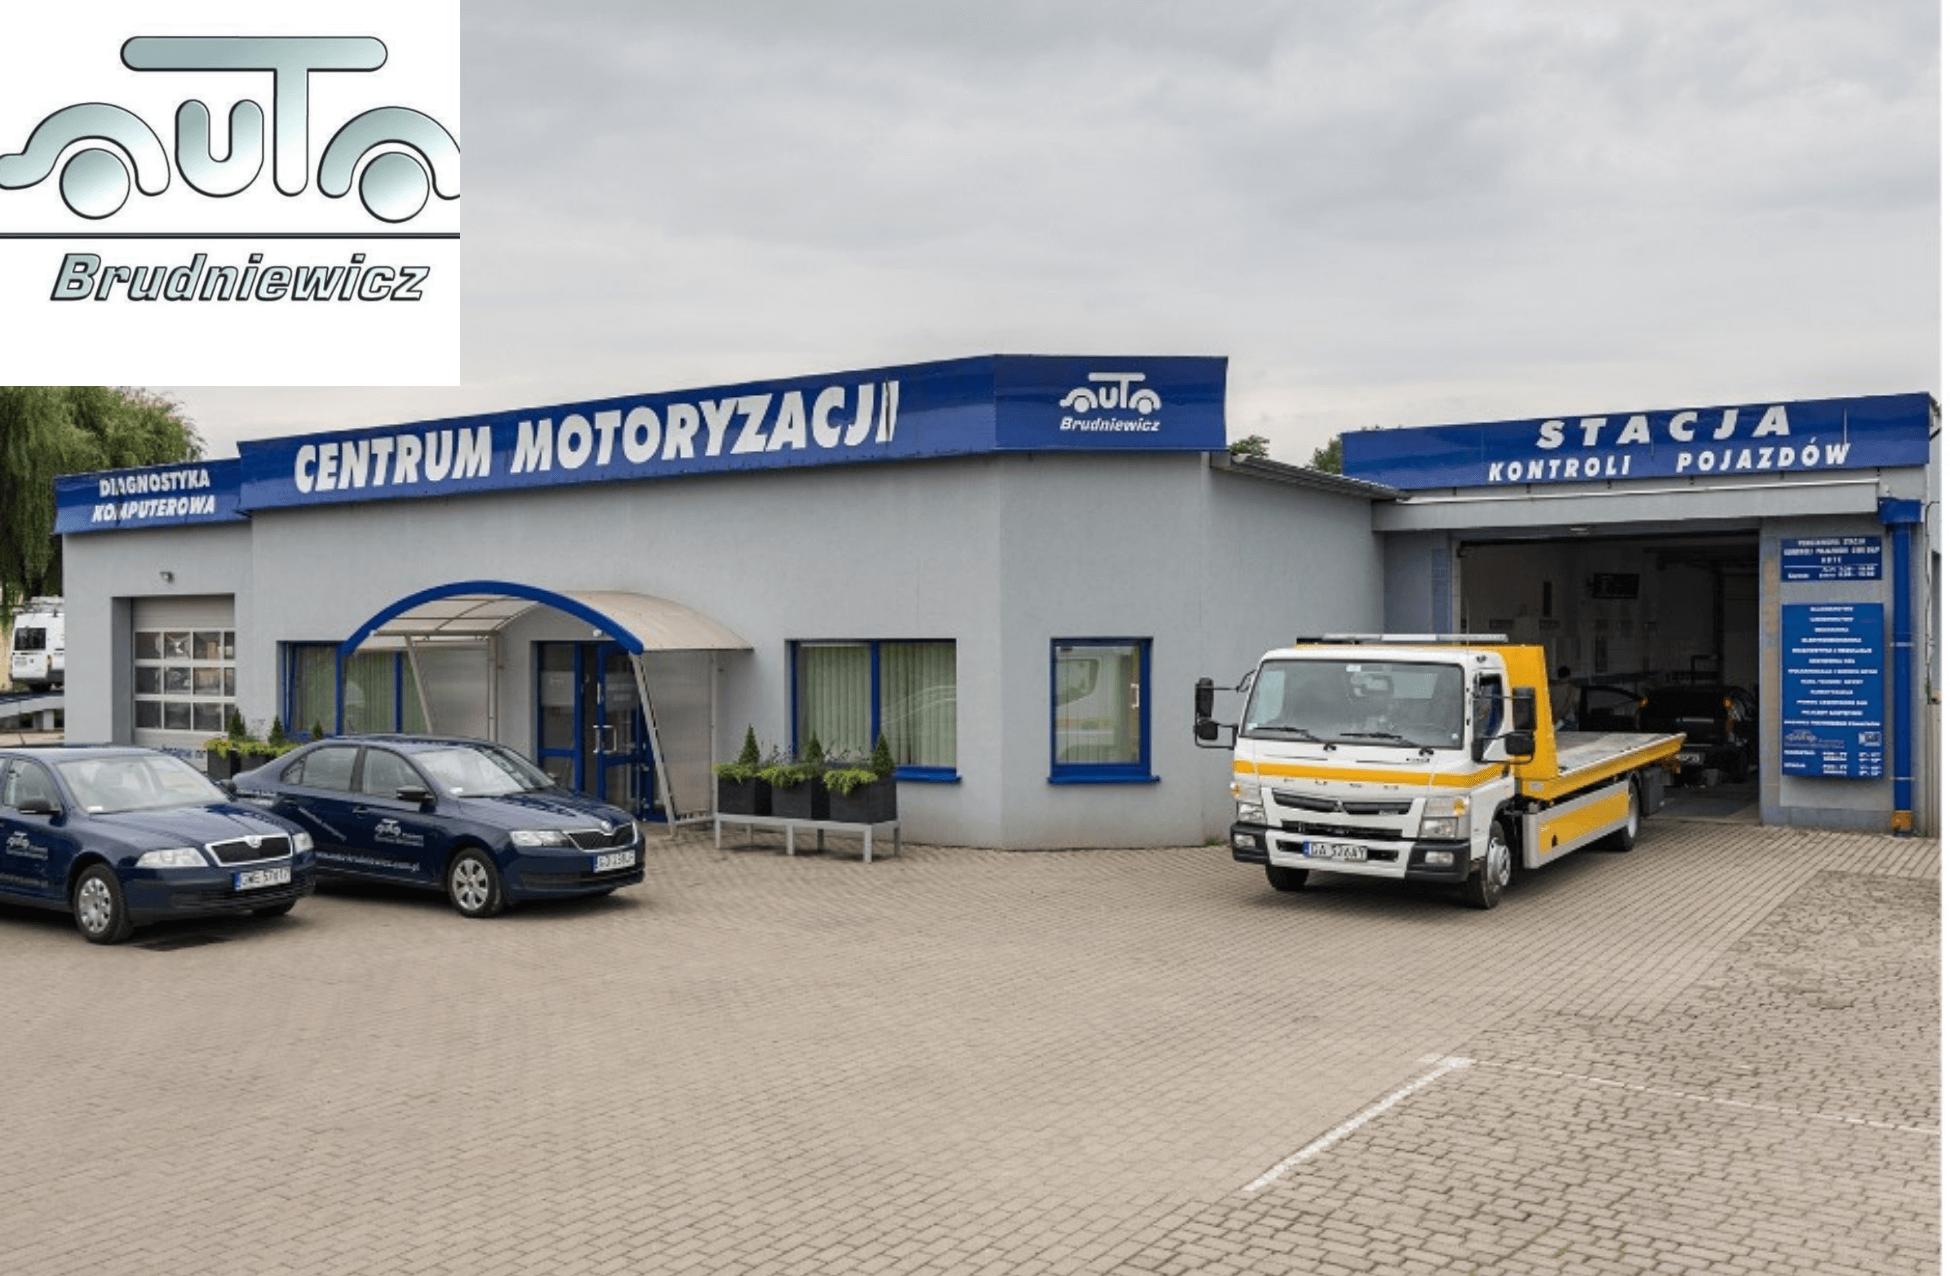 BHP Centrum Motoryzacyjne